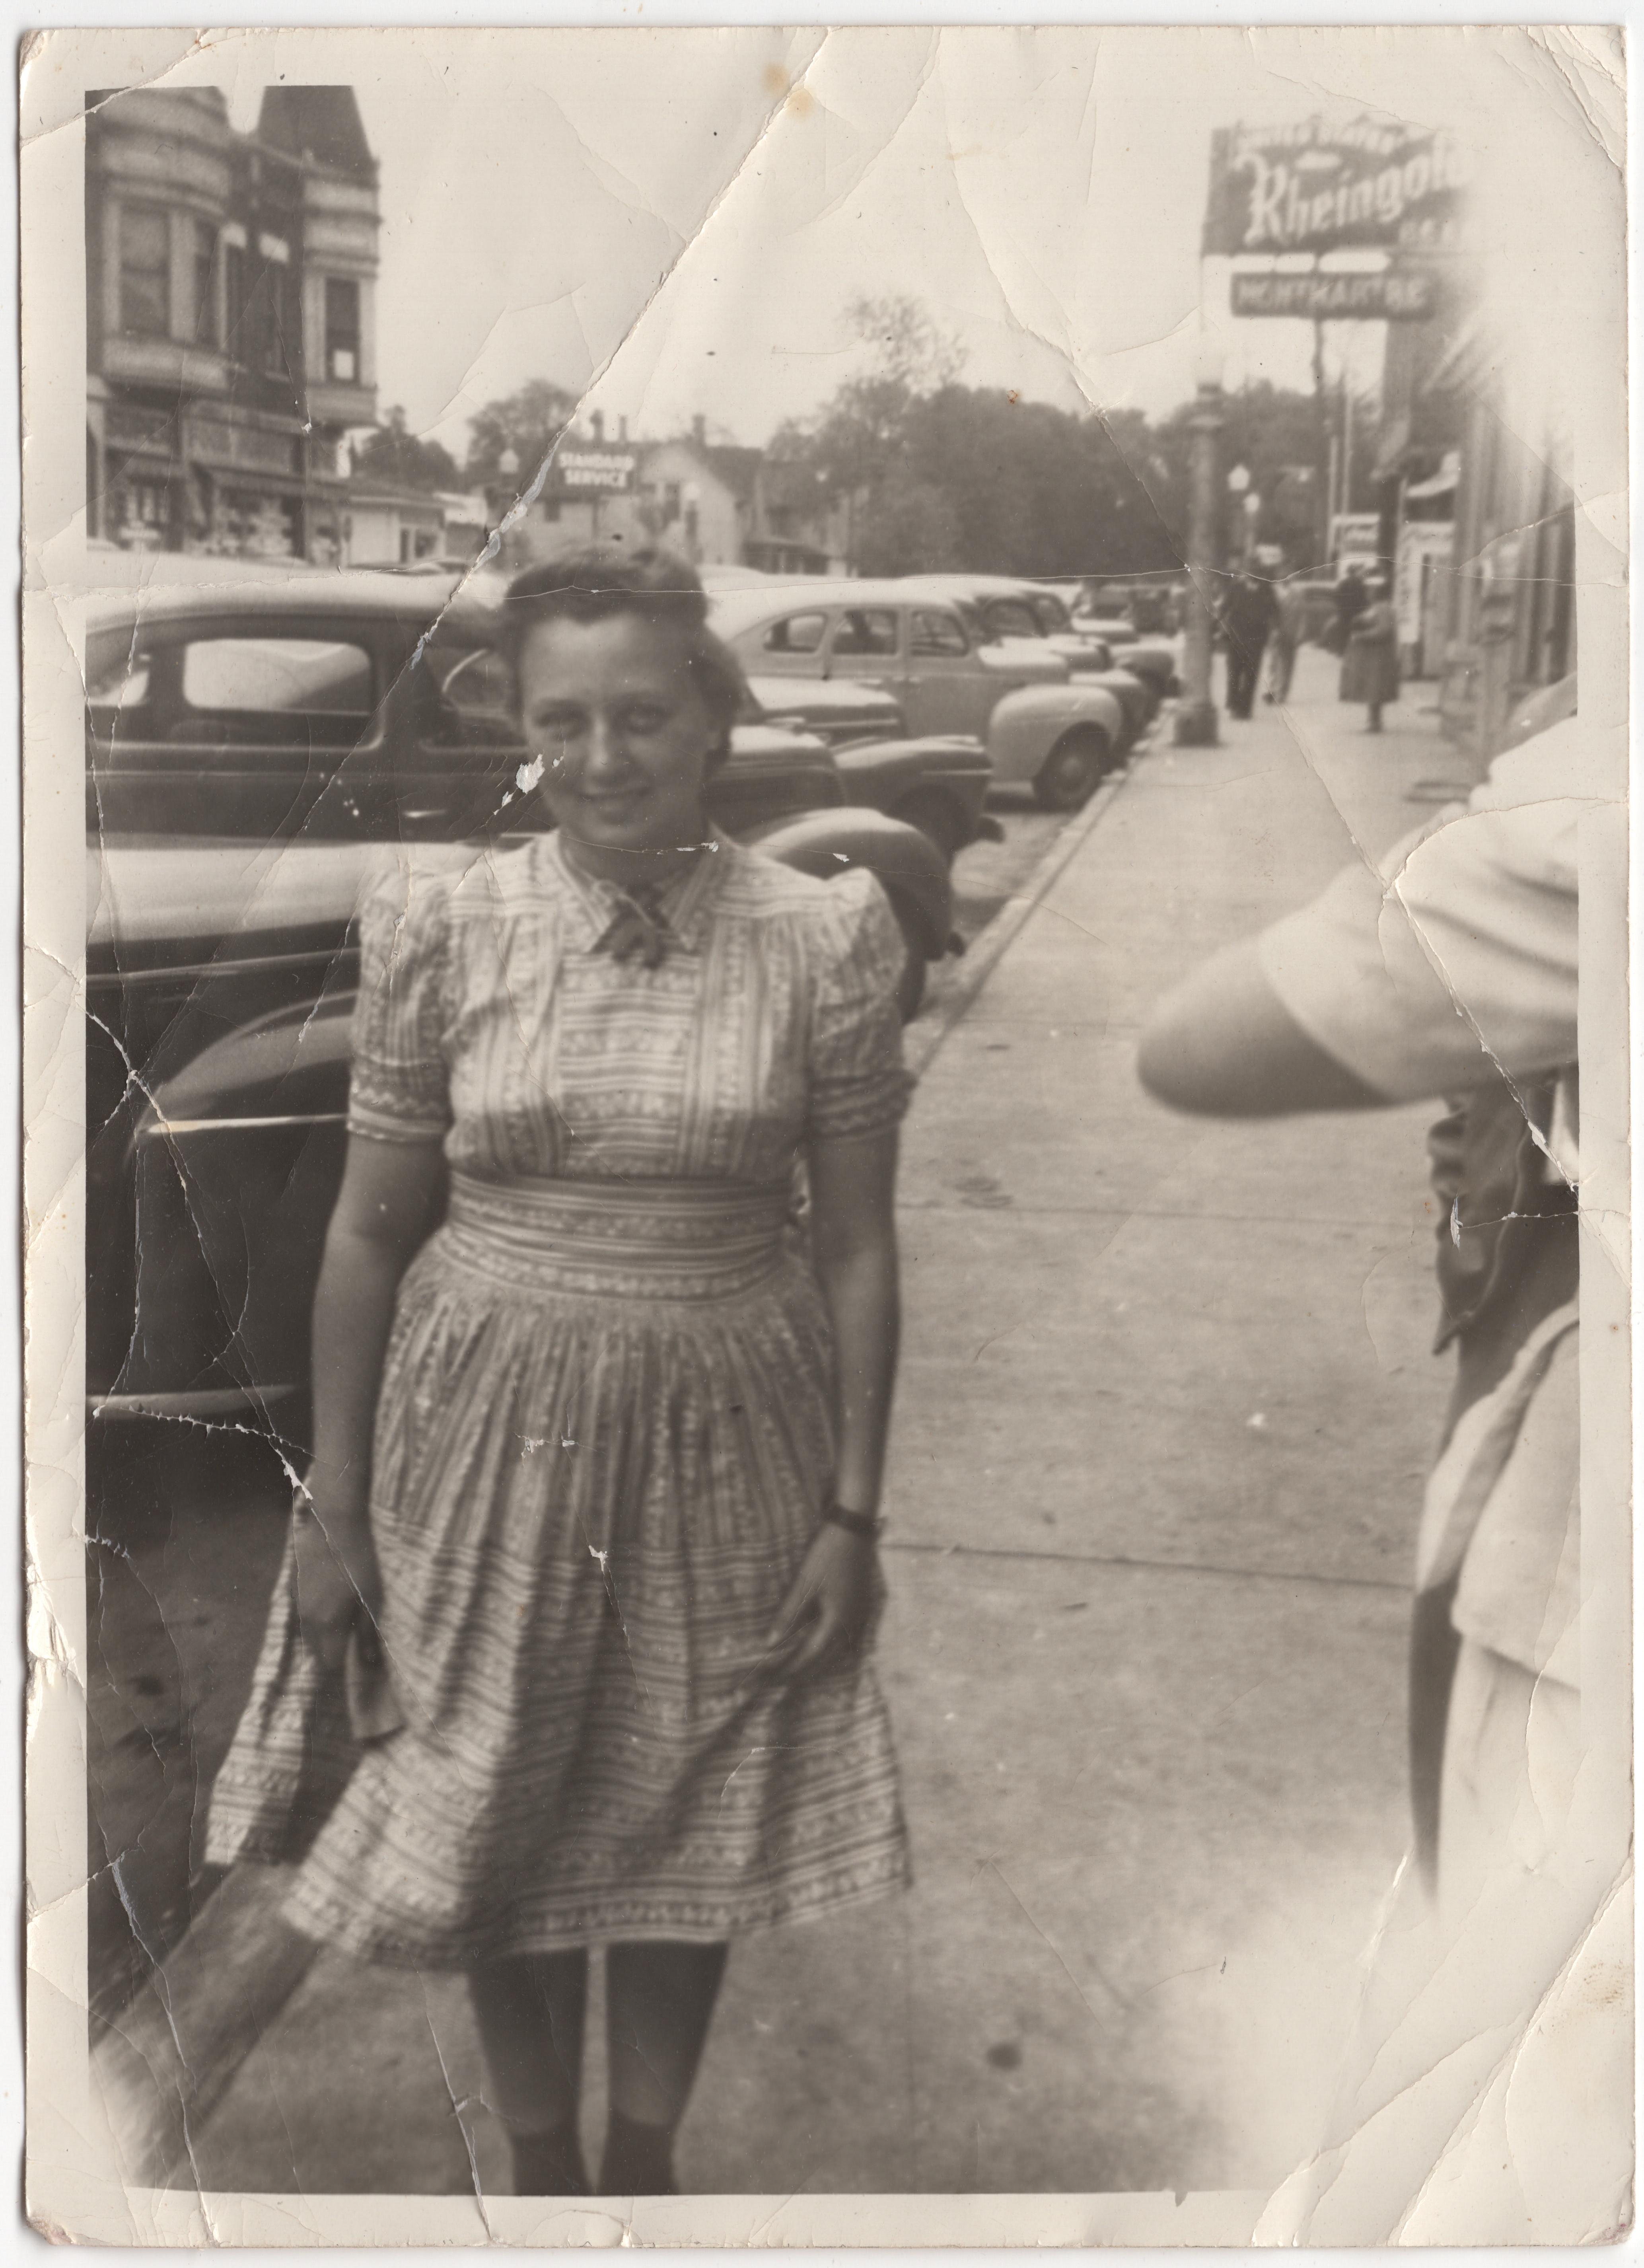 Kaiser_Millie_1940?_DeKalbStreets